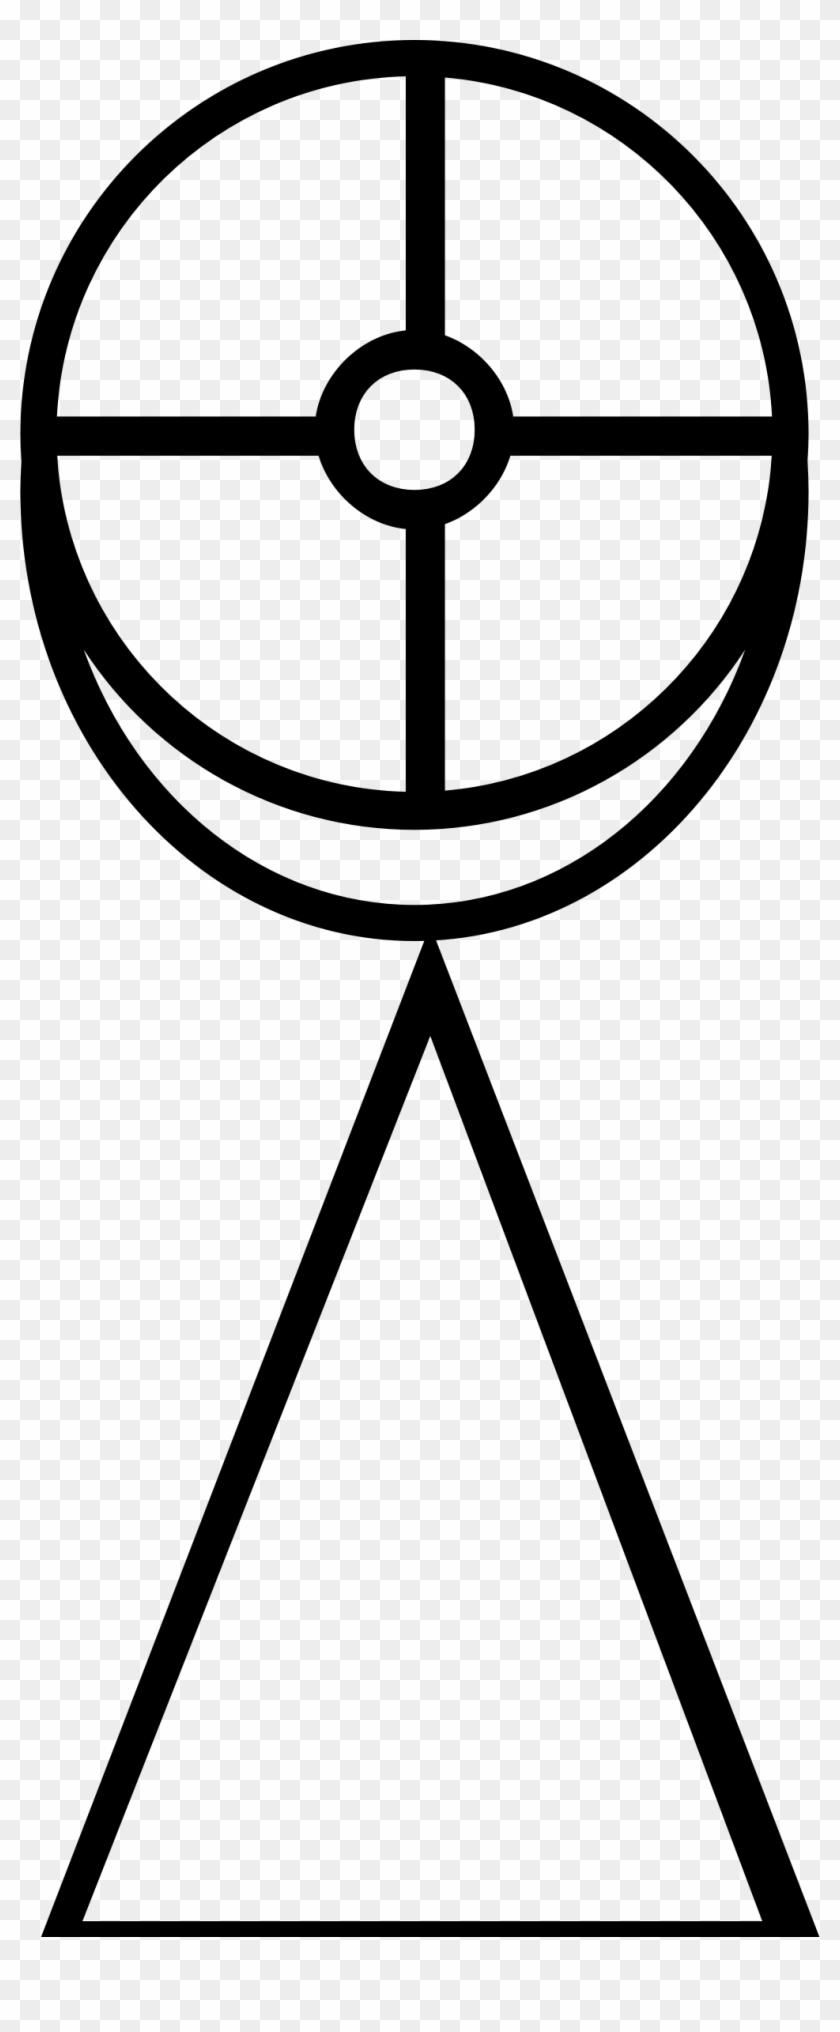 Big Image - Los Angeles Clippers Logo 2016 #133109